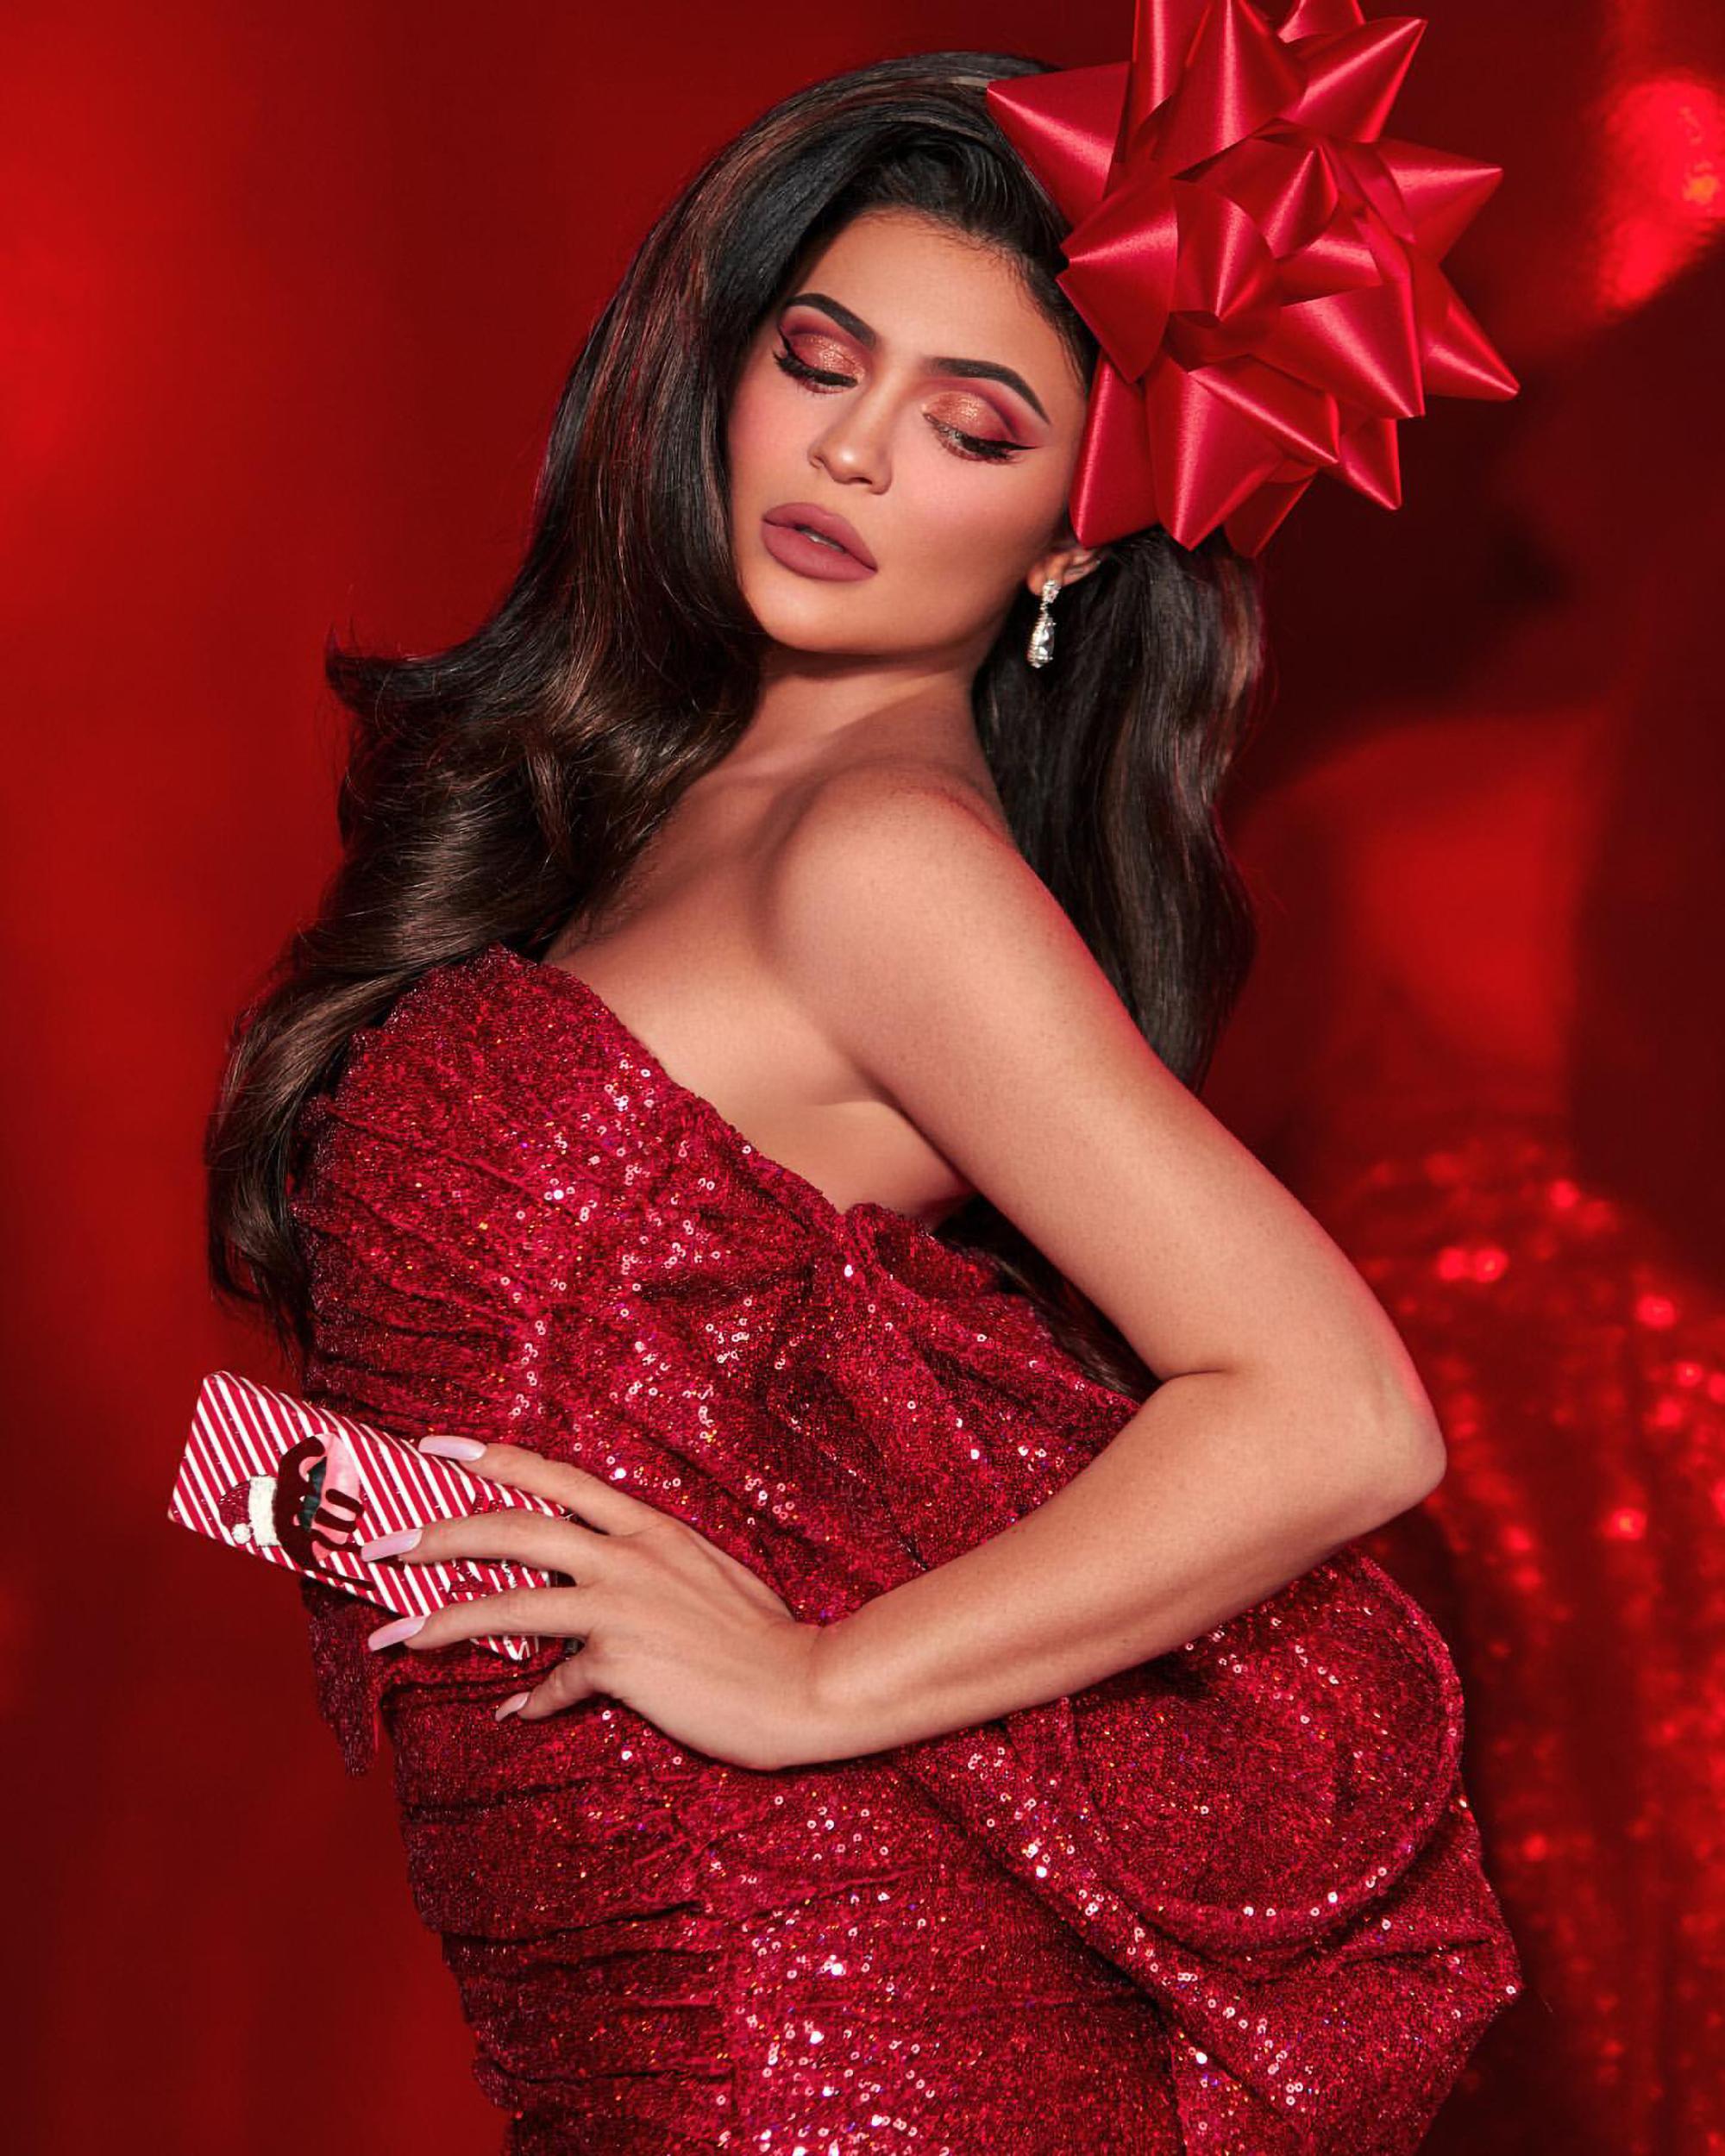 Kylie Jenner Red Dress Wallpaper, HD Celebrities 4K ...